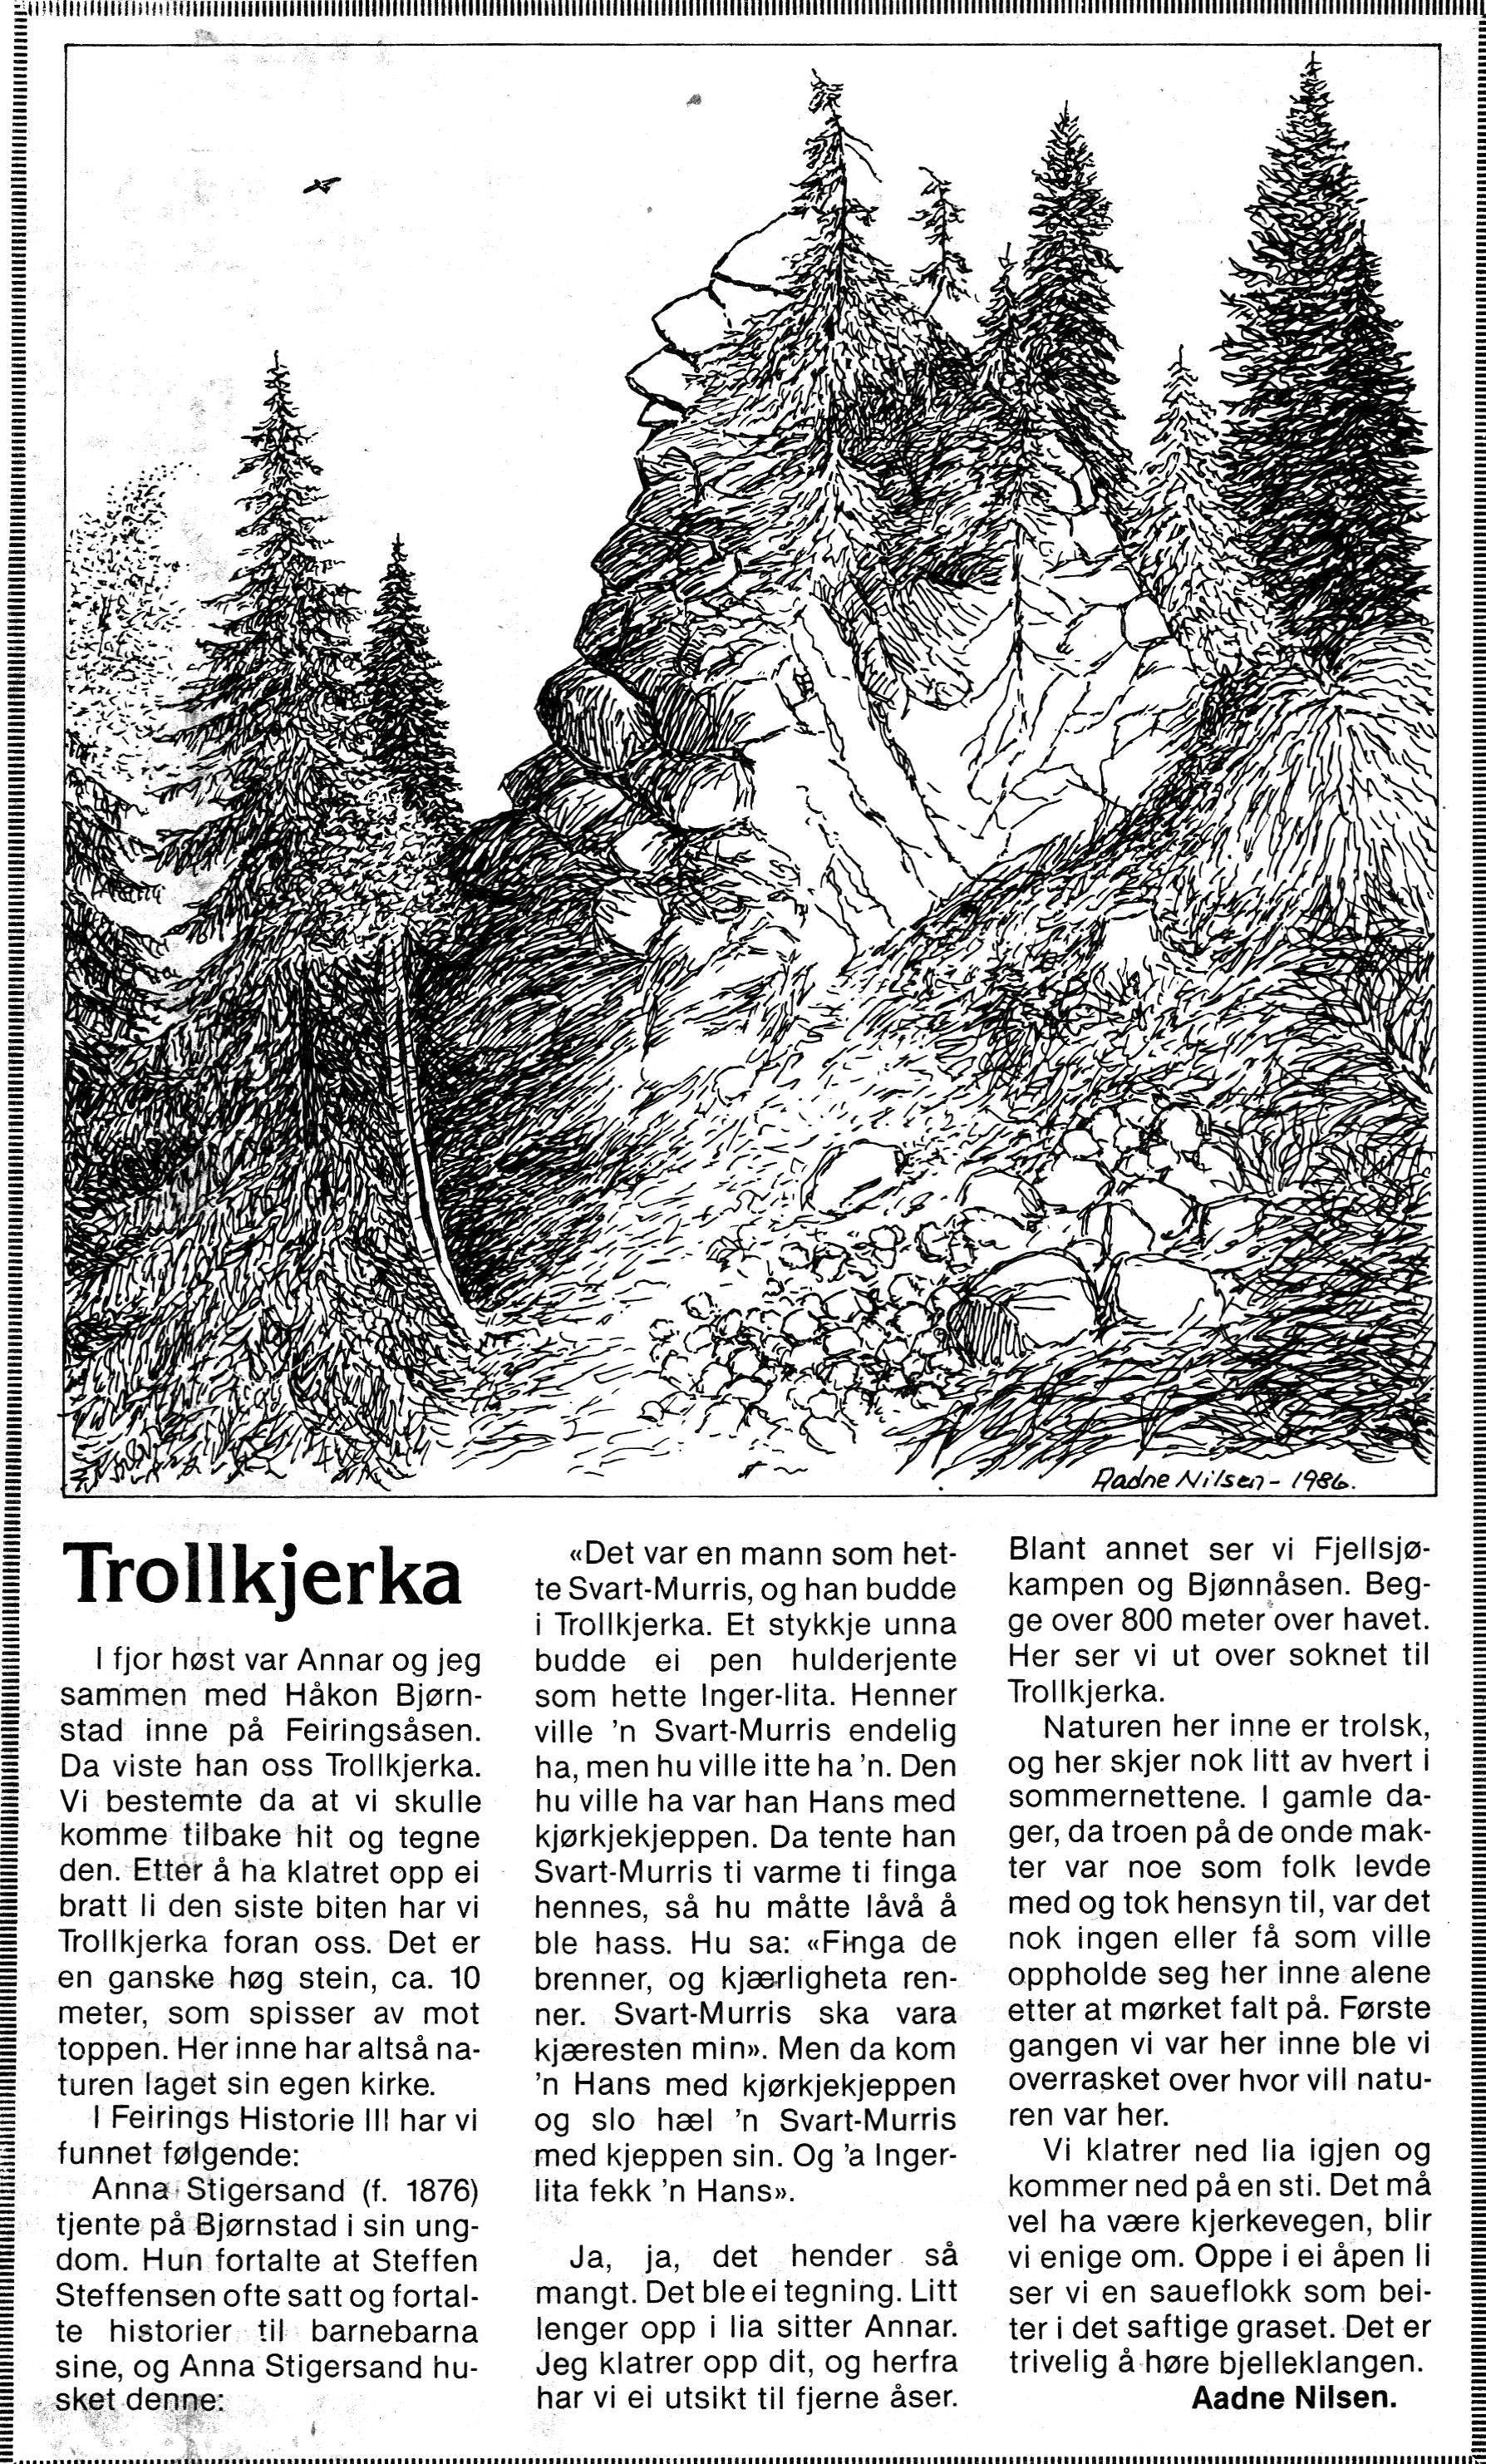 trollkjerka_klipp